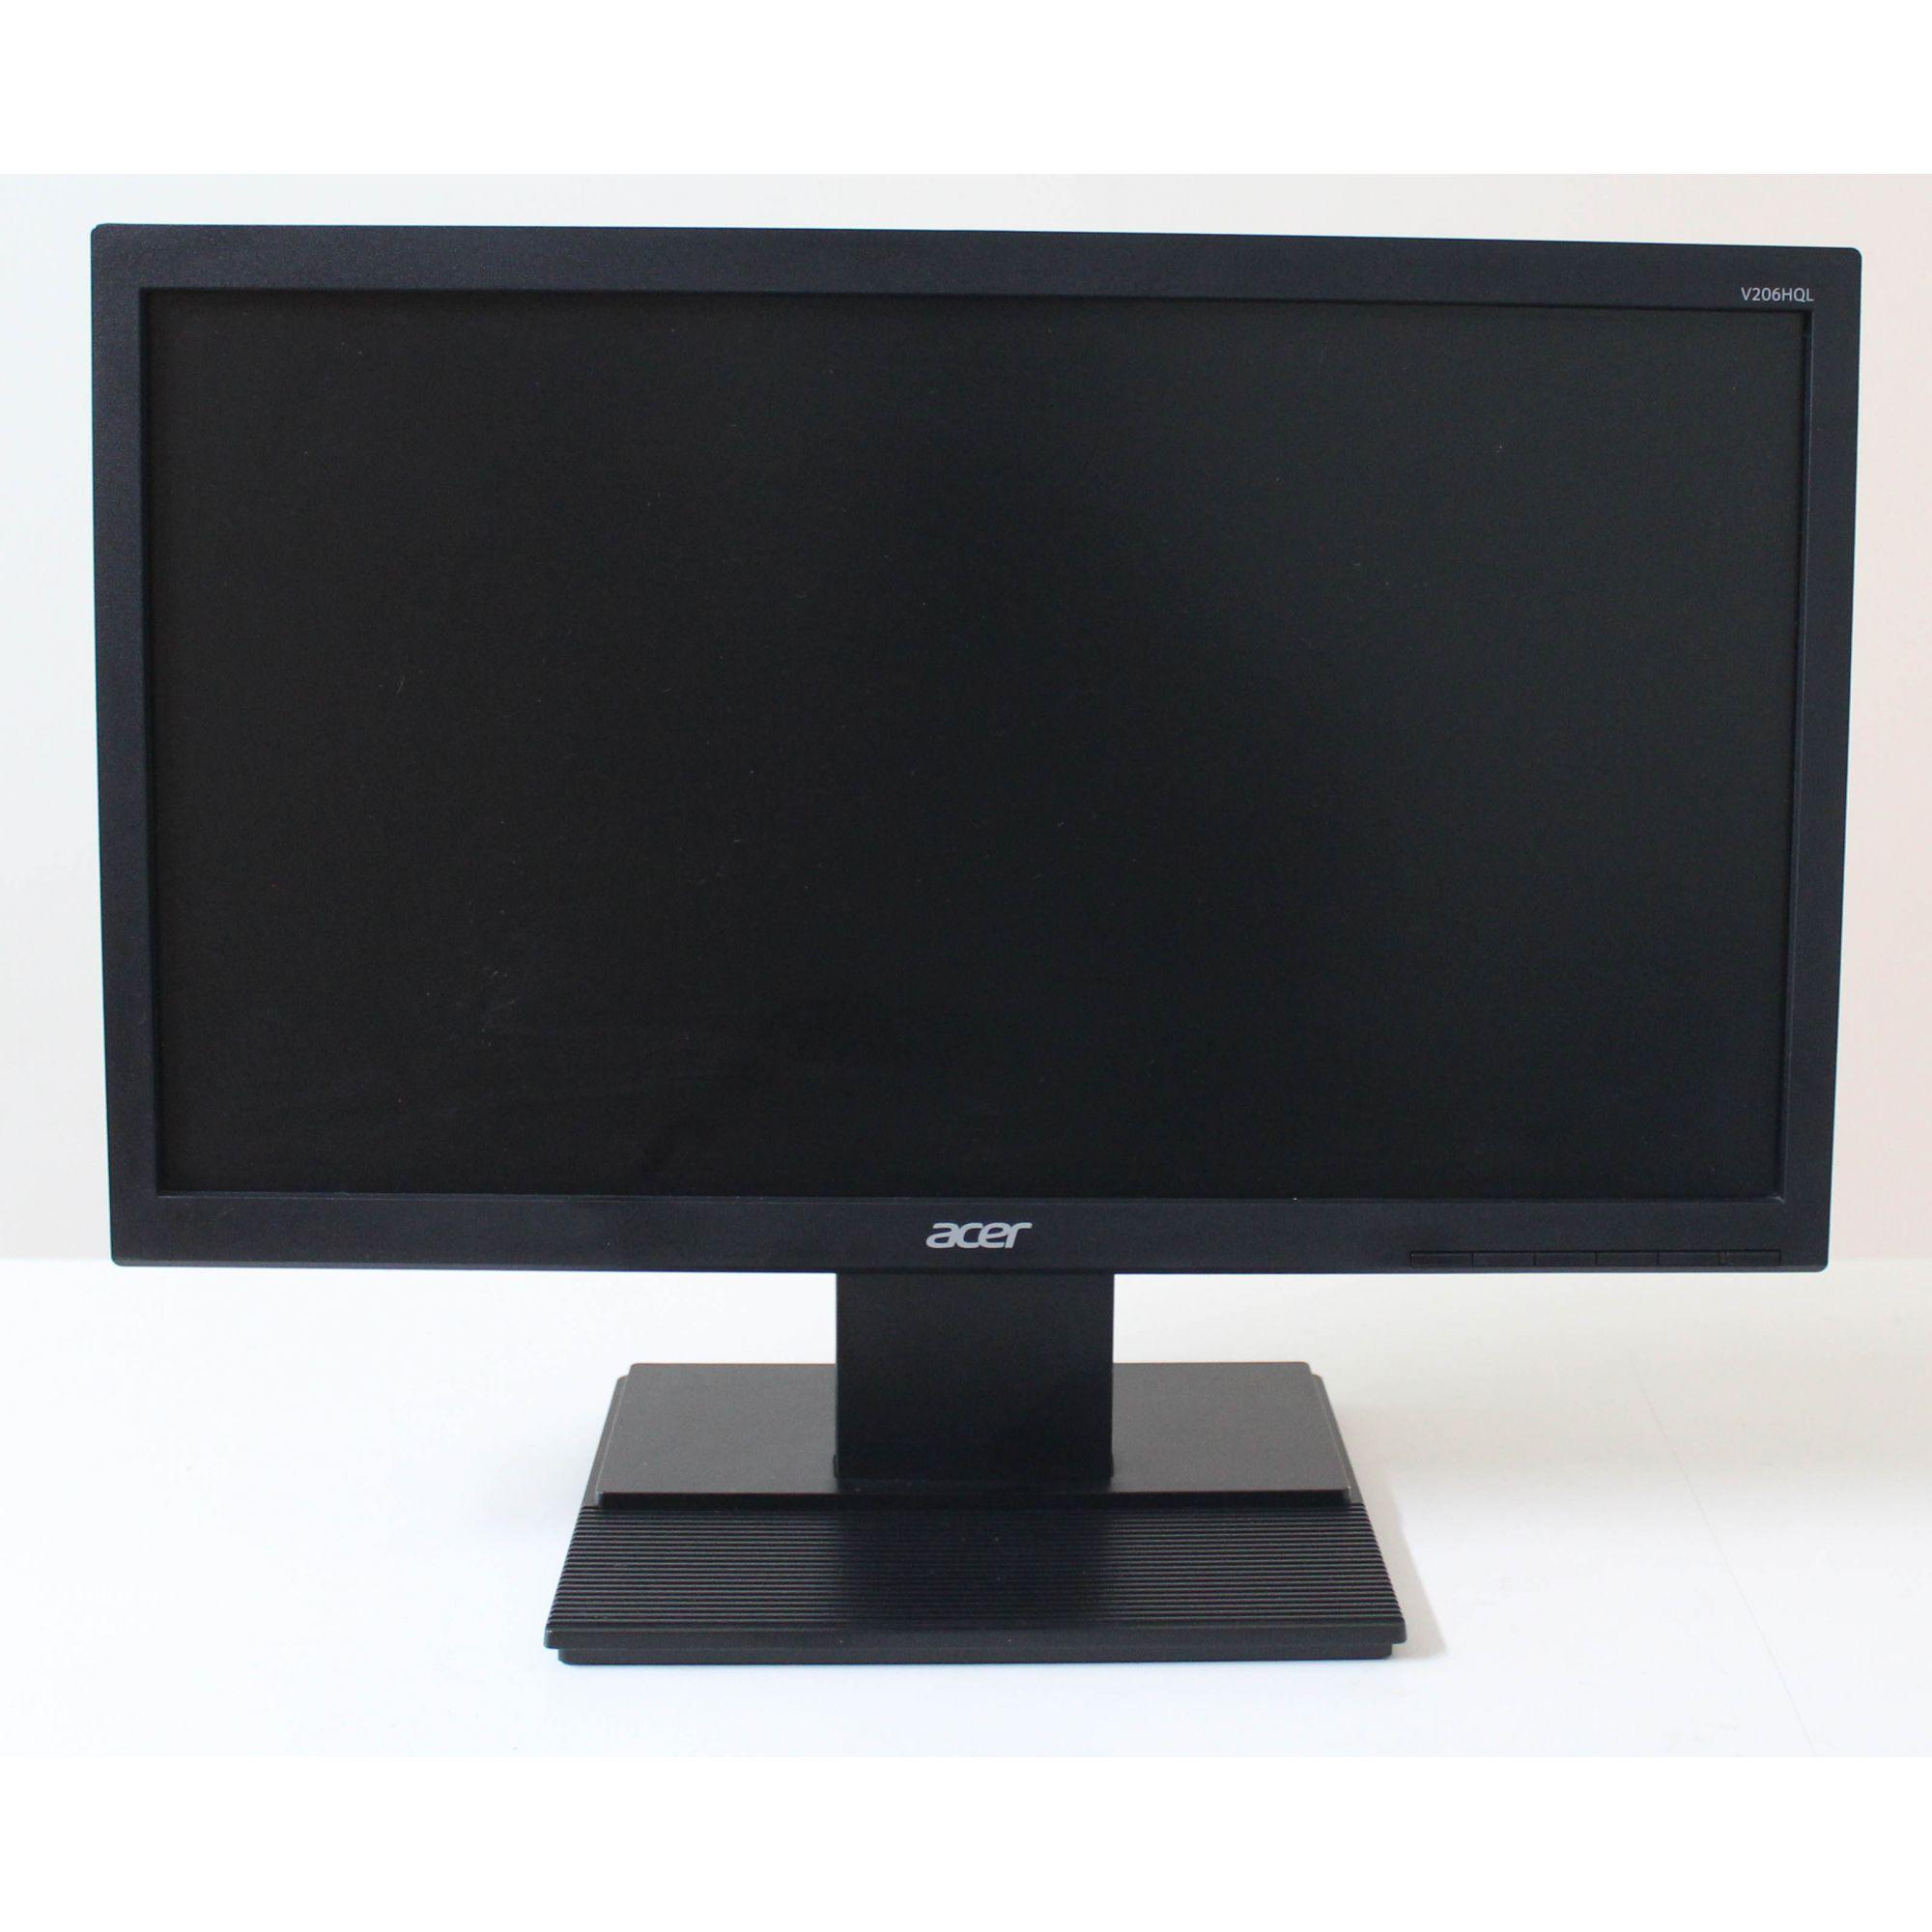 "Monitor Acer LED 19.5"" Widescreen, VGA - V206HQL"